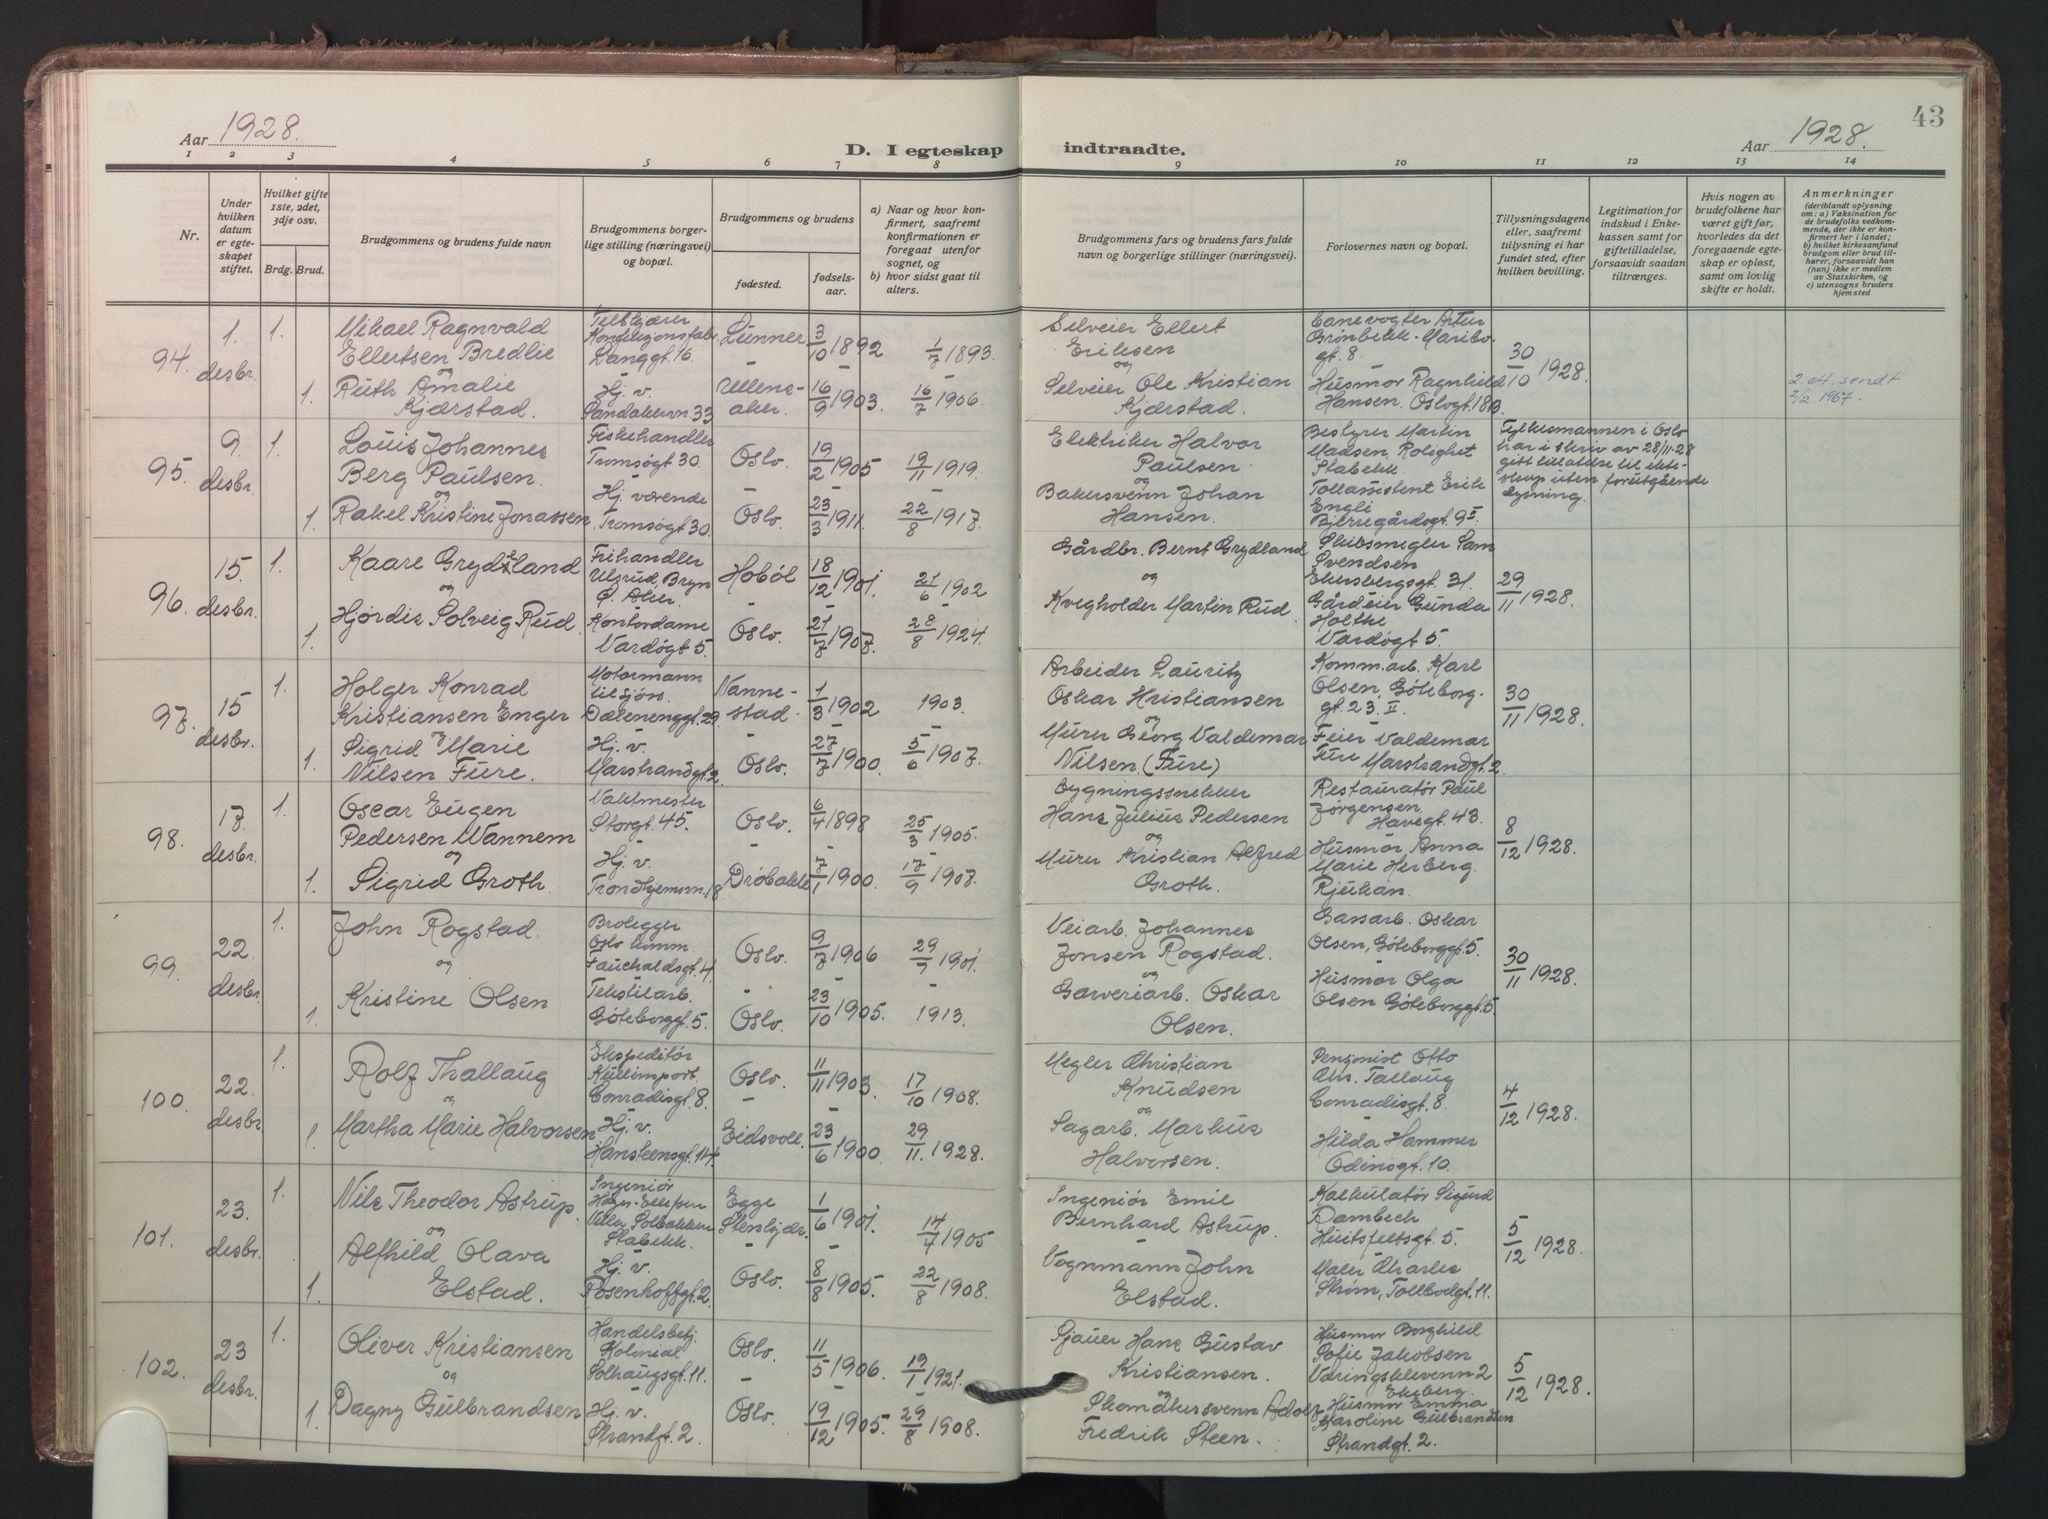 SAO, Petrus prestekontor Kirkebøker, F/Fa/L0016: Parish register (official) no. 16, 1925-1936, p. 43